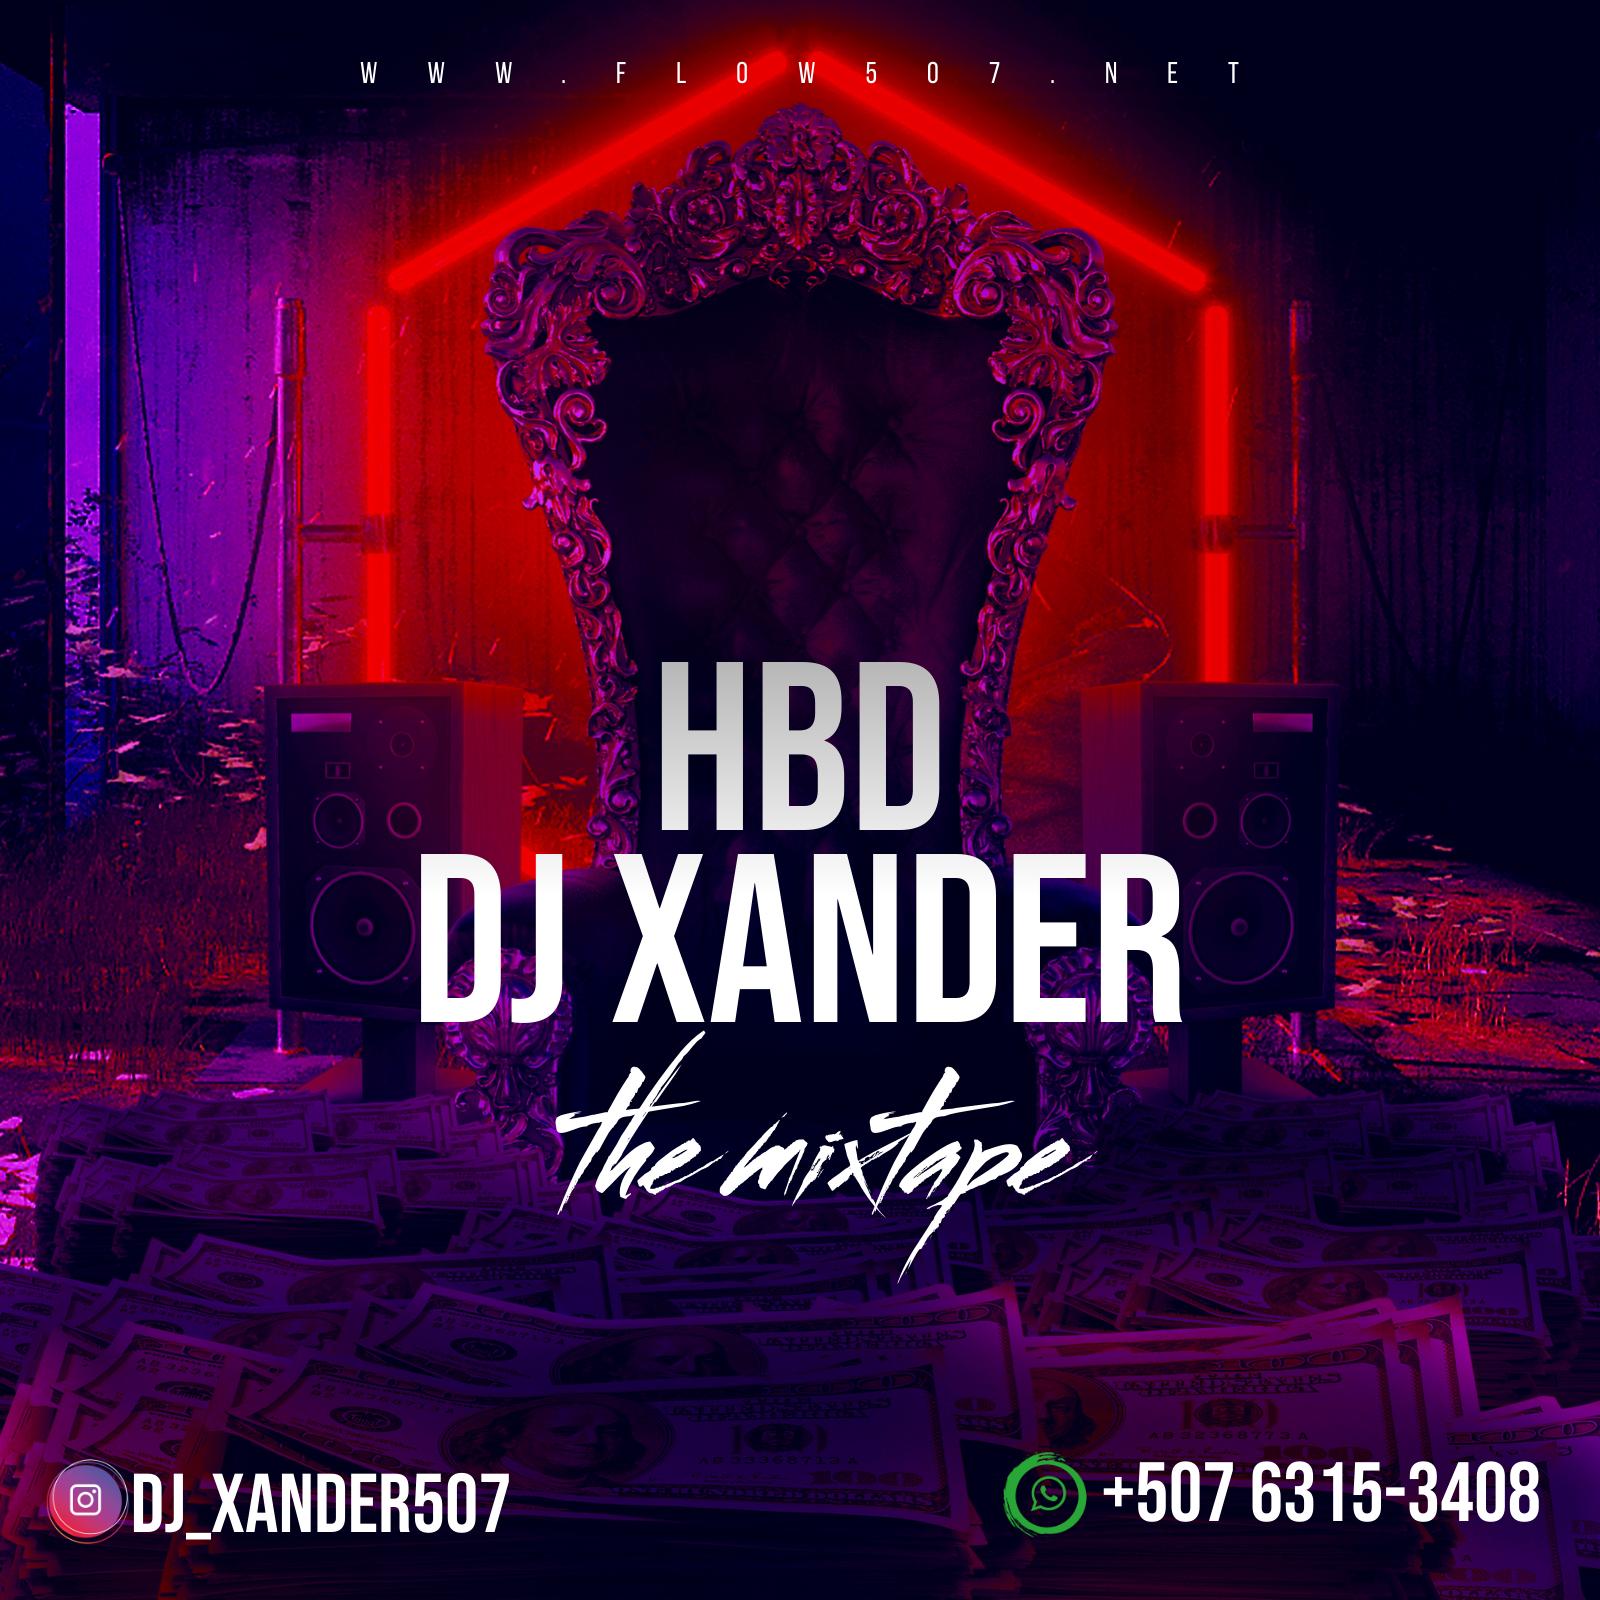 Dj Xander507 - HBD MixTape 2k21